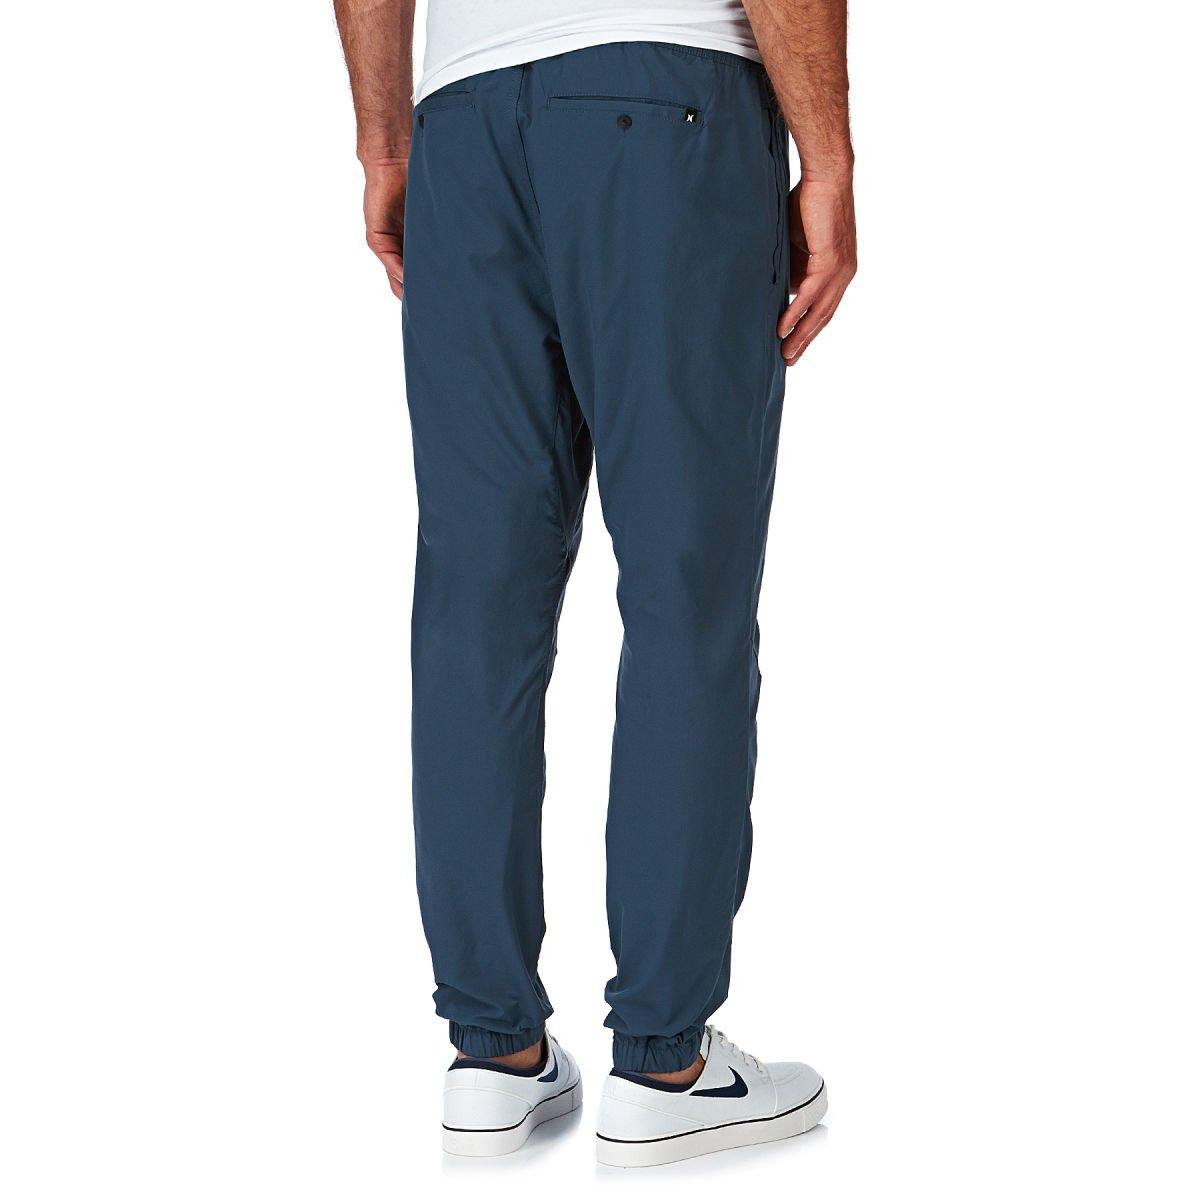 d73a8ad164c Pants Men Hurley Dri-Fit Drifter Jogger Pants  Amazon.co.uk  Clothing